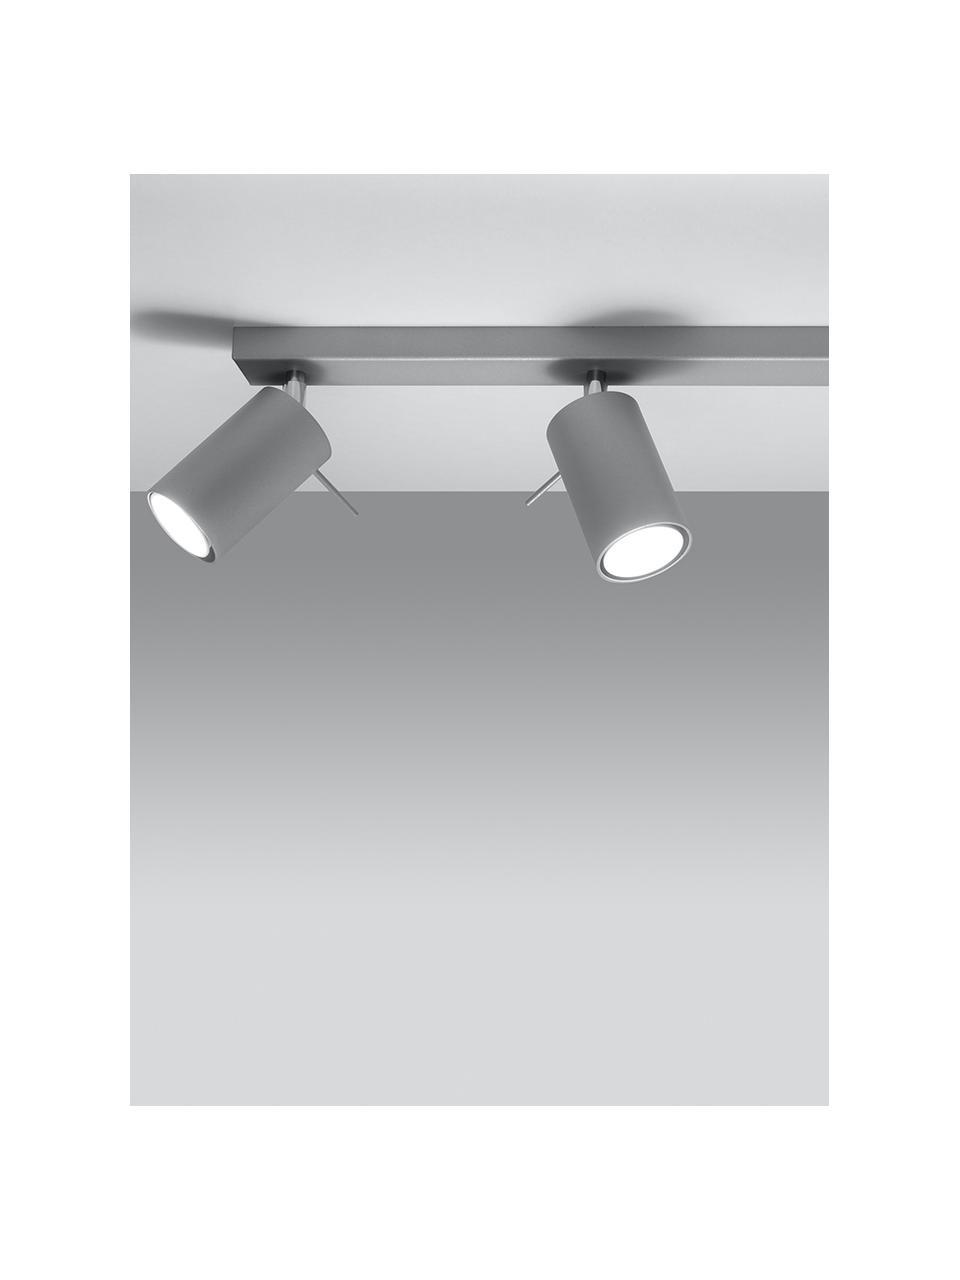 Deckenstrahler Etna in Grau, Baldachin: Stahl, lackiert, Grau, 45 x 15 cm